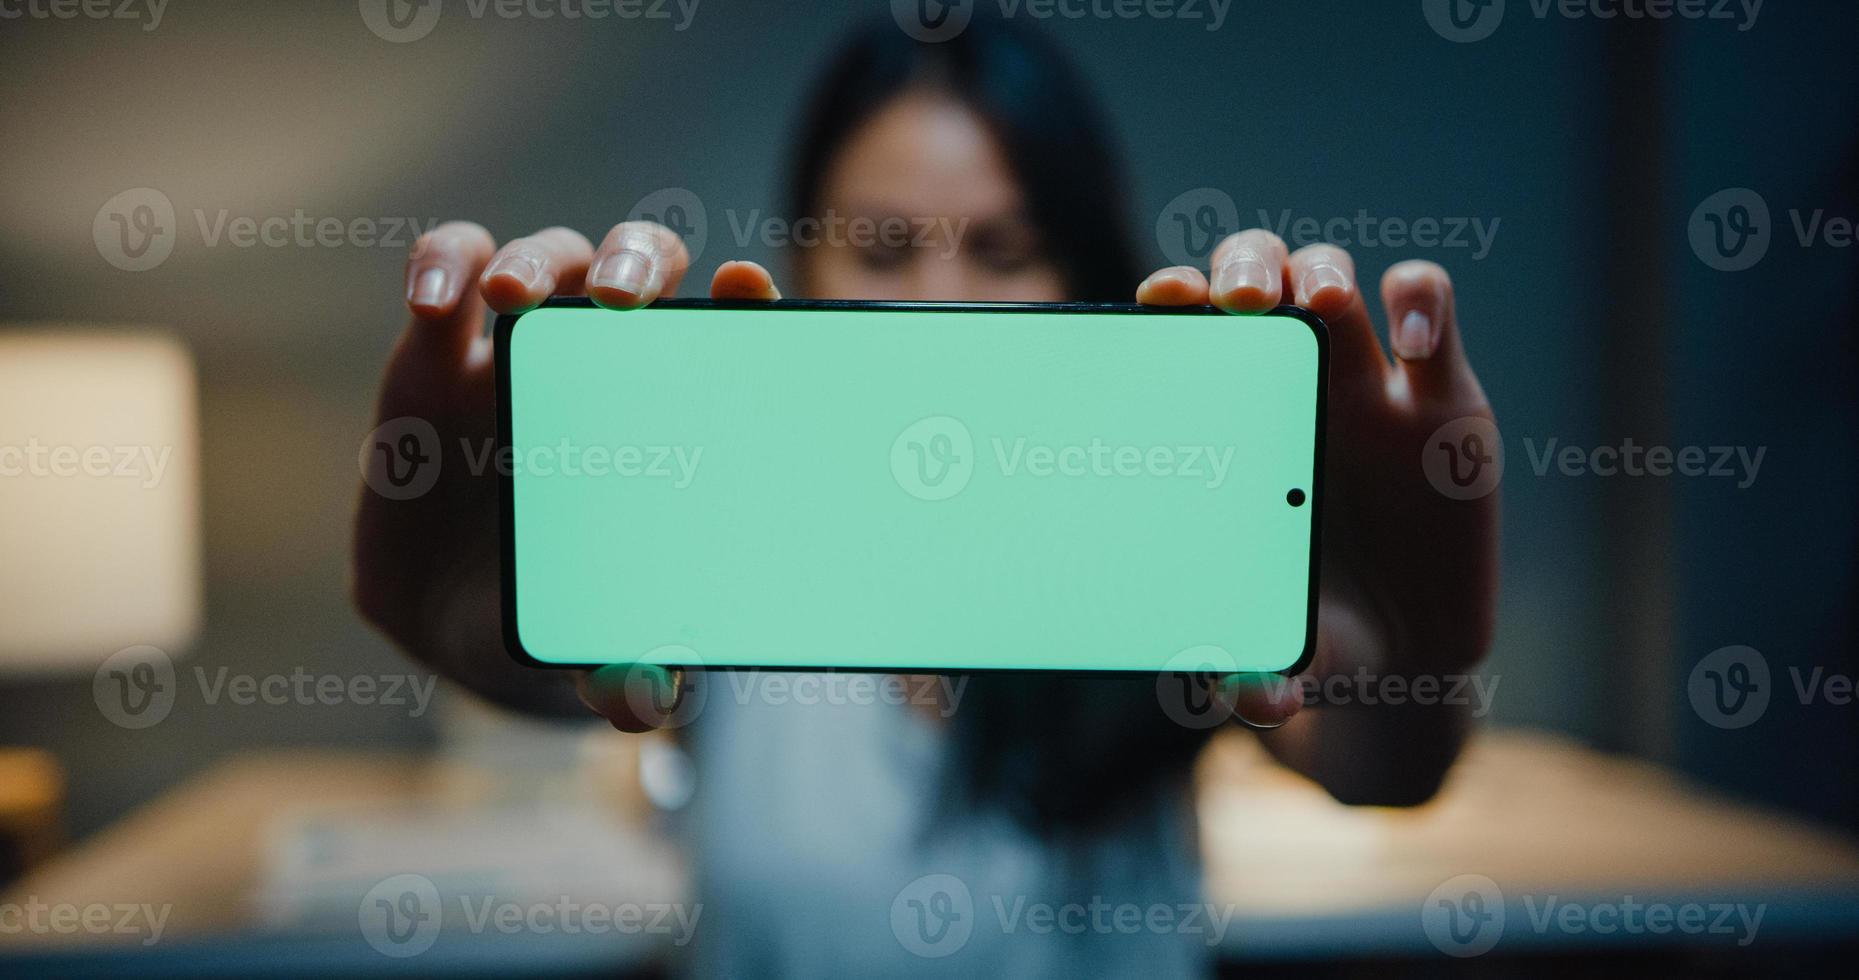 jong aziatisch meisje slimme vrijetijdskleding kijkend naar camera, glimlach, gelukkig en toont mock-up scherm smartphone in moderne huisnacht. thuiswerken, sociale afstand, chroma key mobiele telefoon, surfen op internet. foto